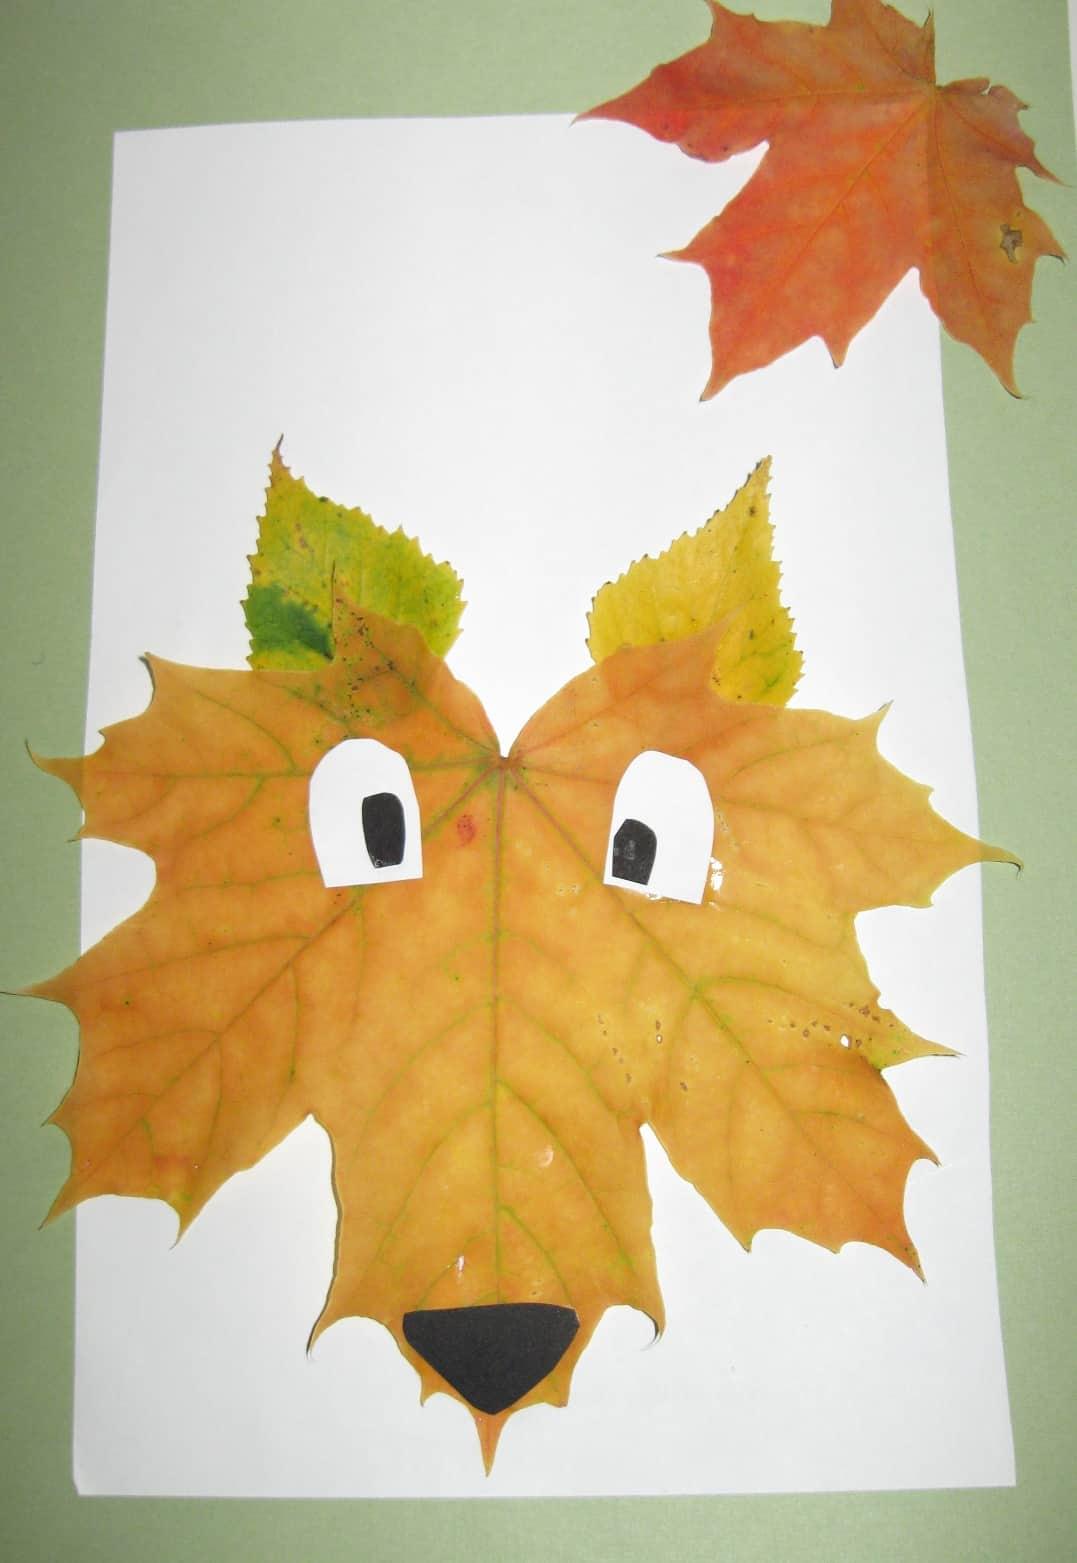 Pretty Crafts Involving Leaves